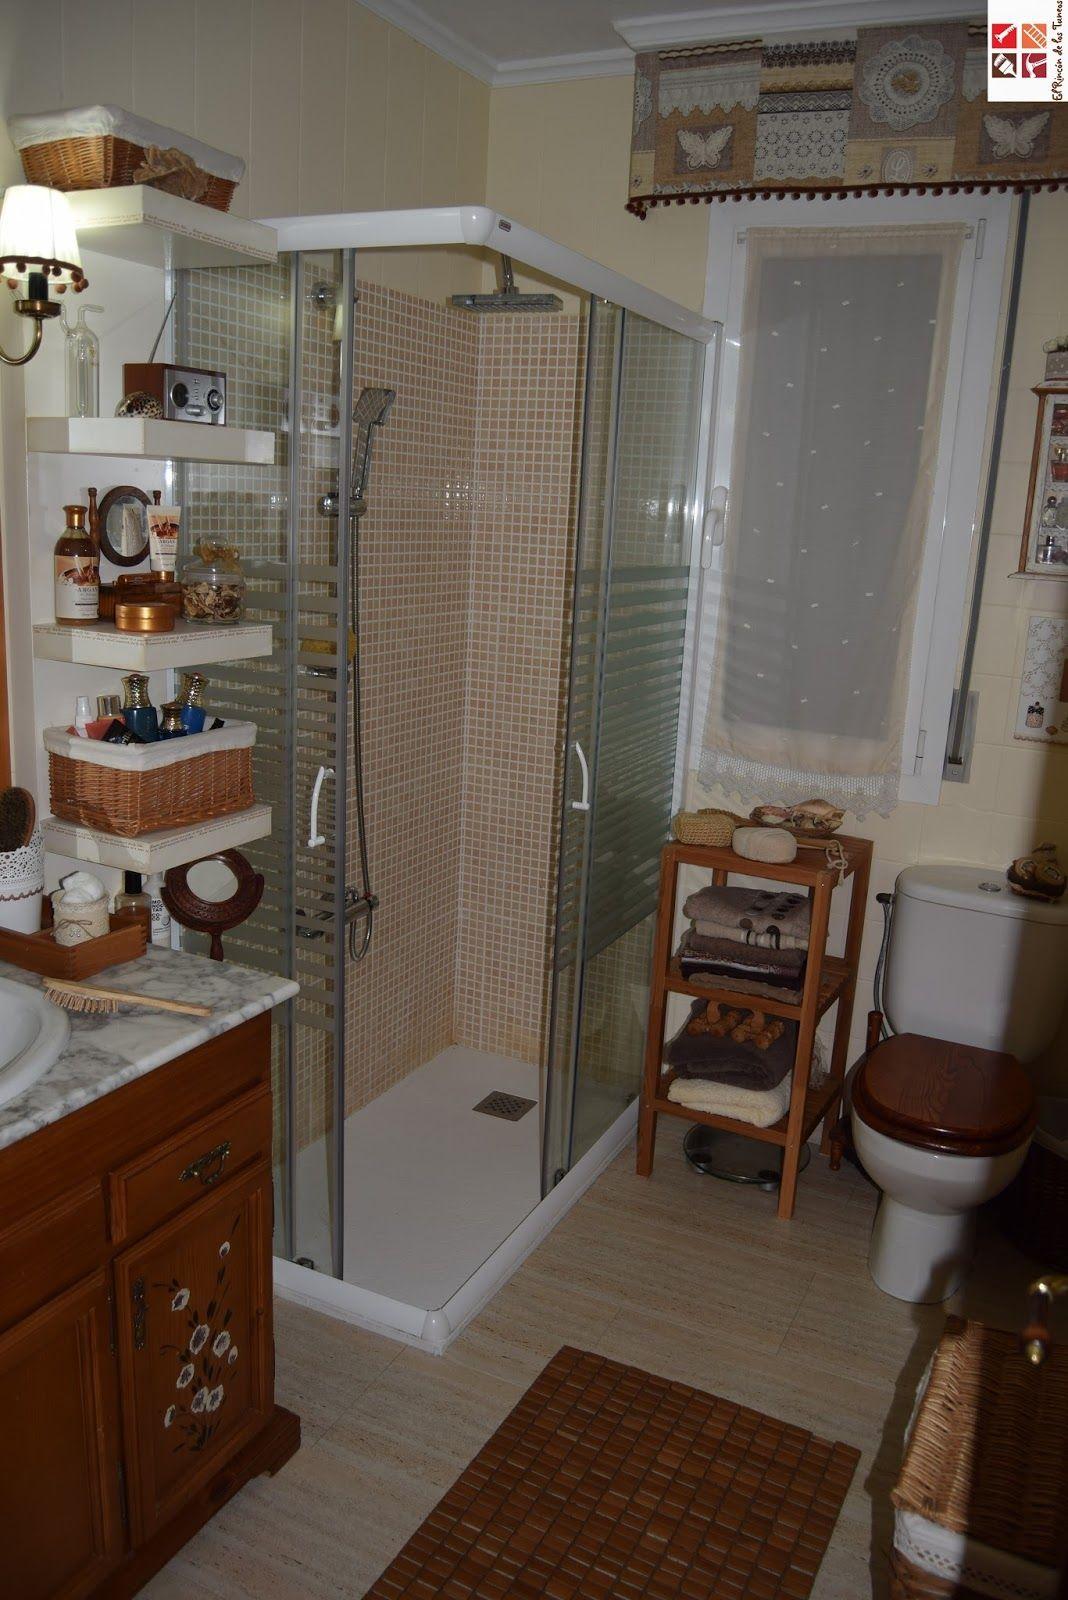 renovar cuarto de baño | Baños, Bañera de esquina